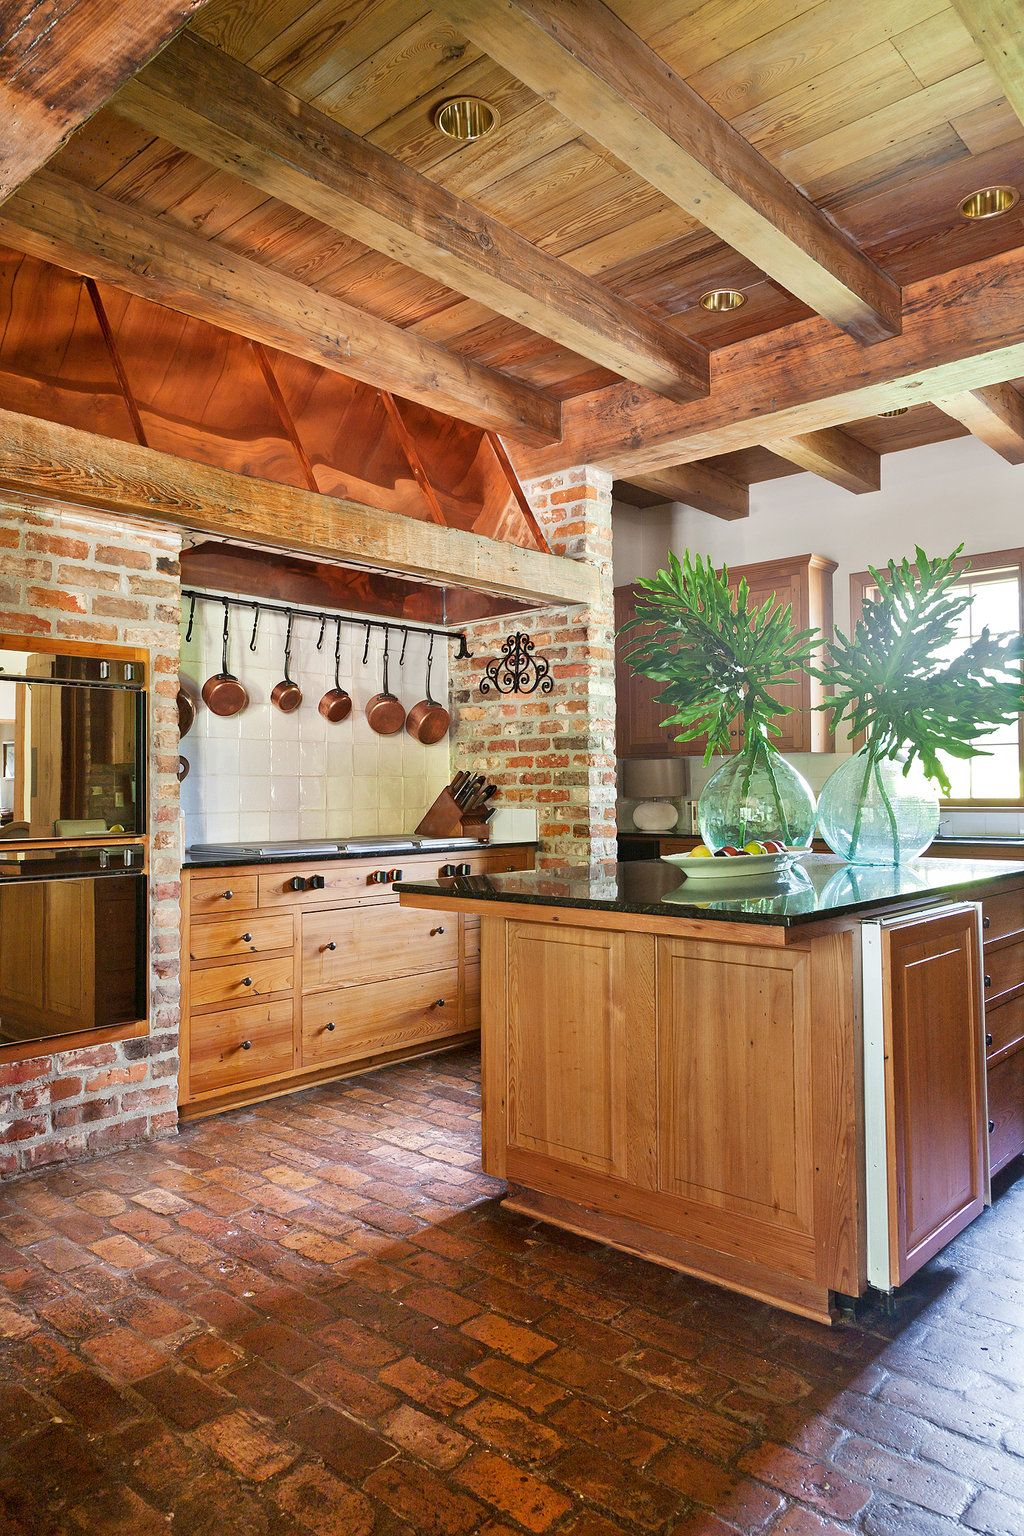 Wood Kitchen Floors Laminate Countertops Homes For 3 Million Dining Pinterest Brick